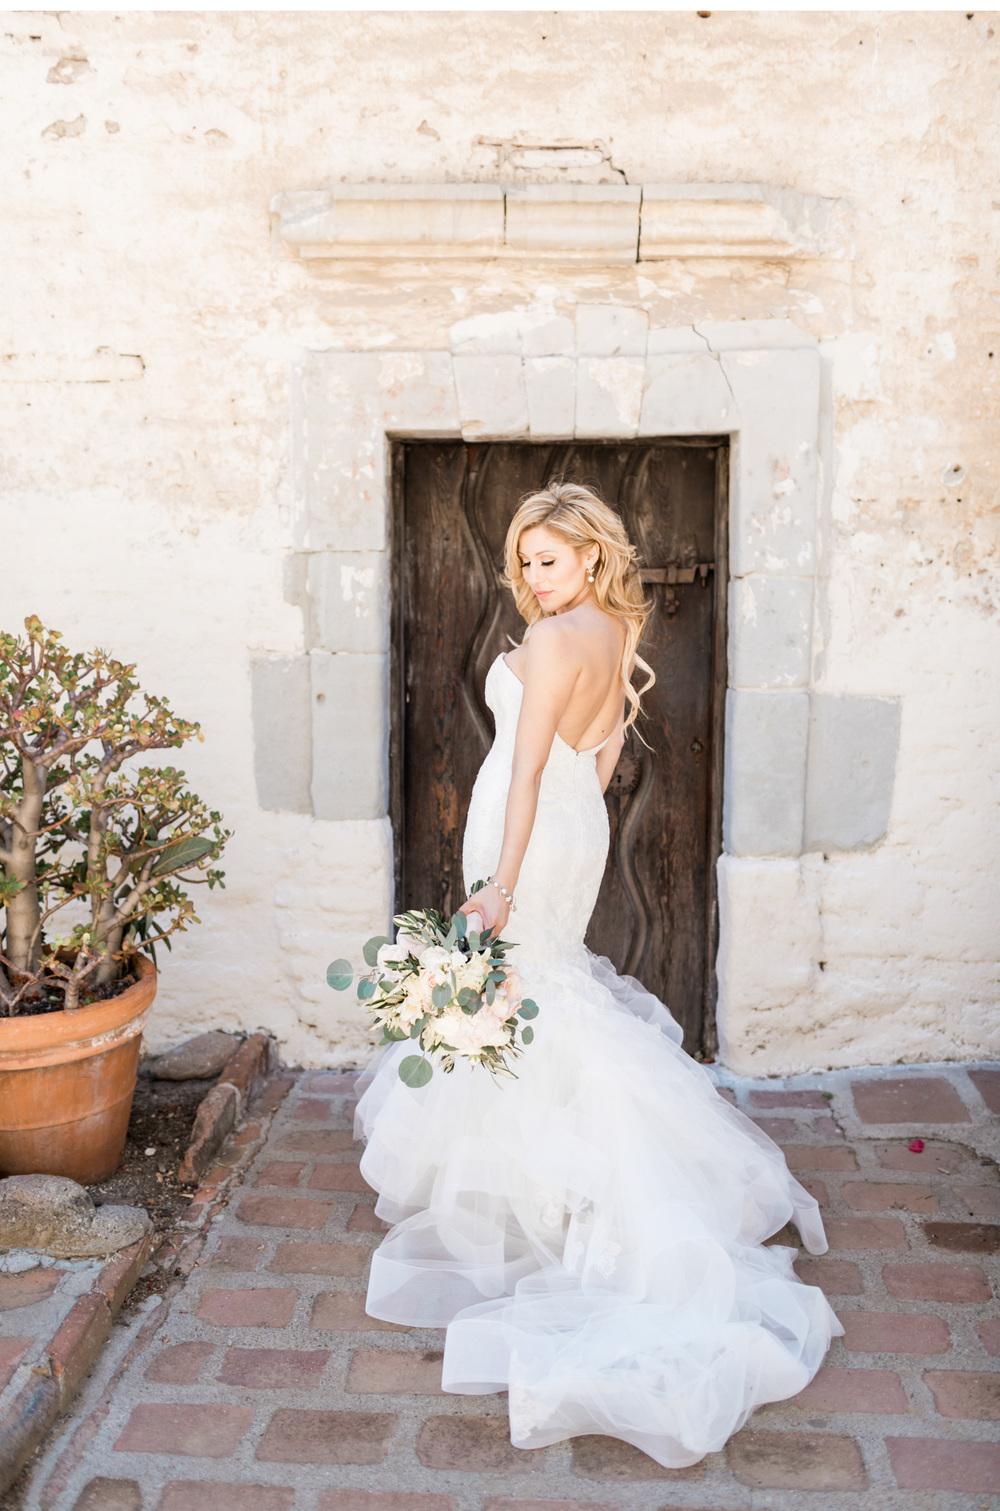 San-Juan-Capistrano-Wedding-Style-Me-Pretty-Natalie-Schutt-Photography_07.jpg